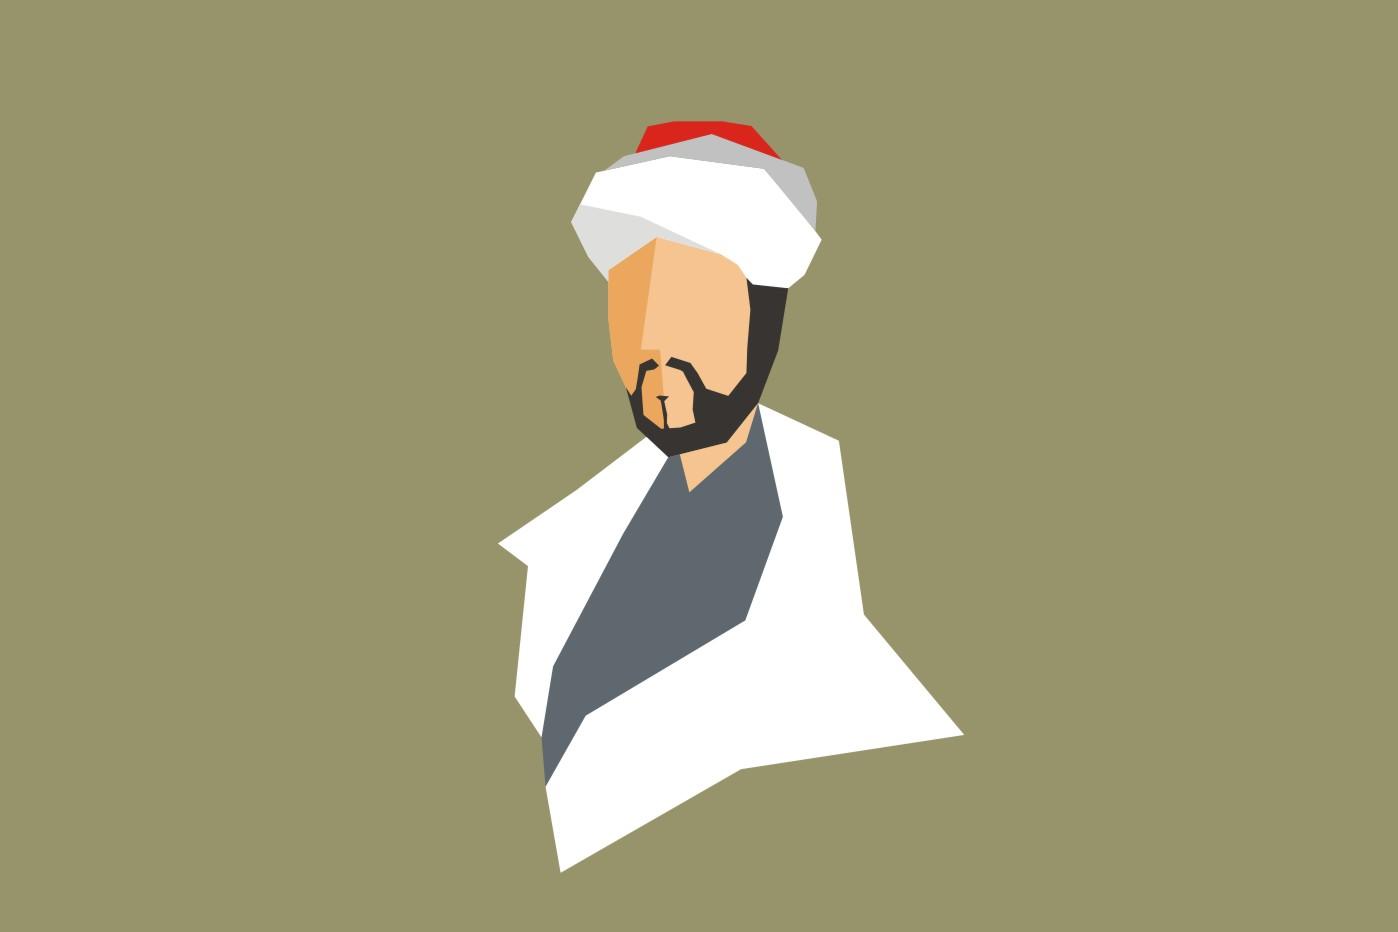 Jimat antisakit yang dimiliki Abu Nawas